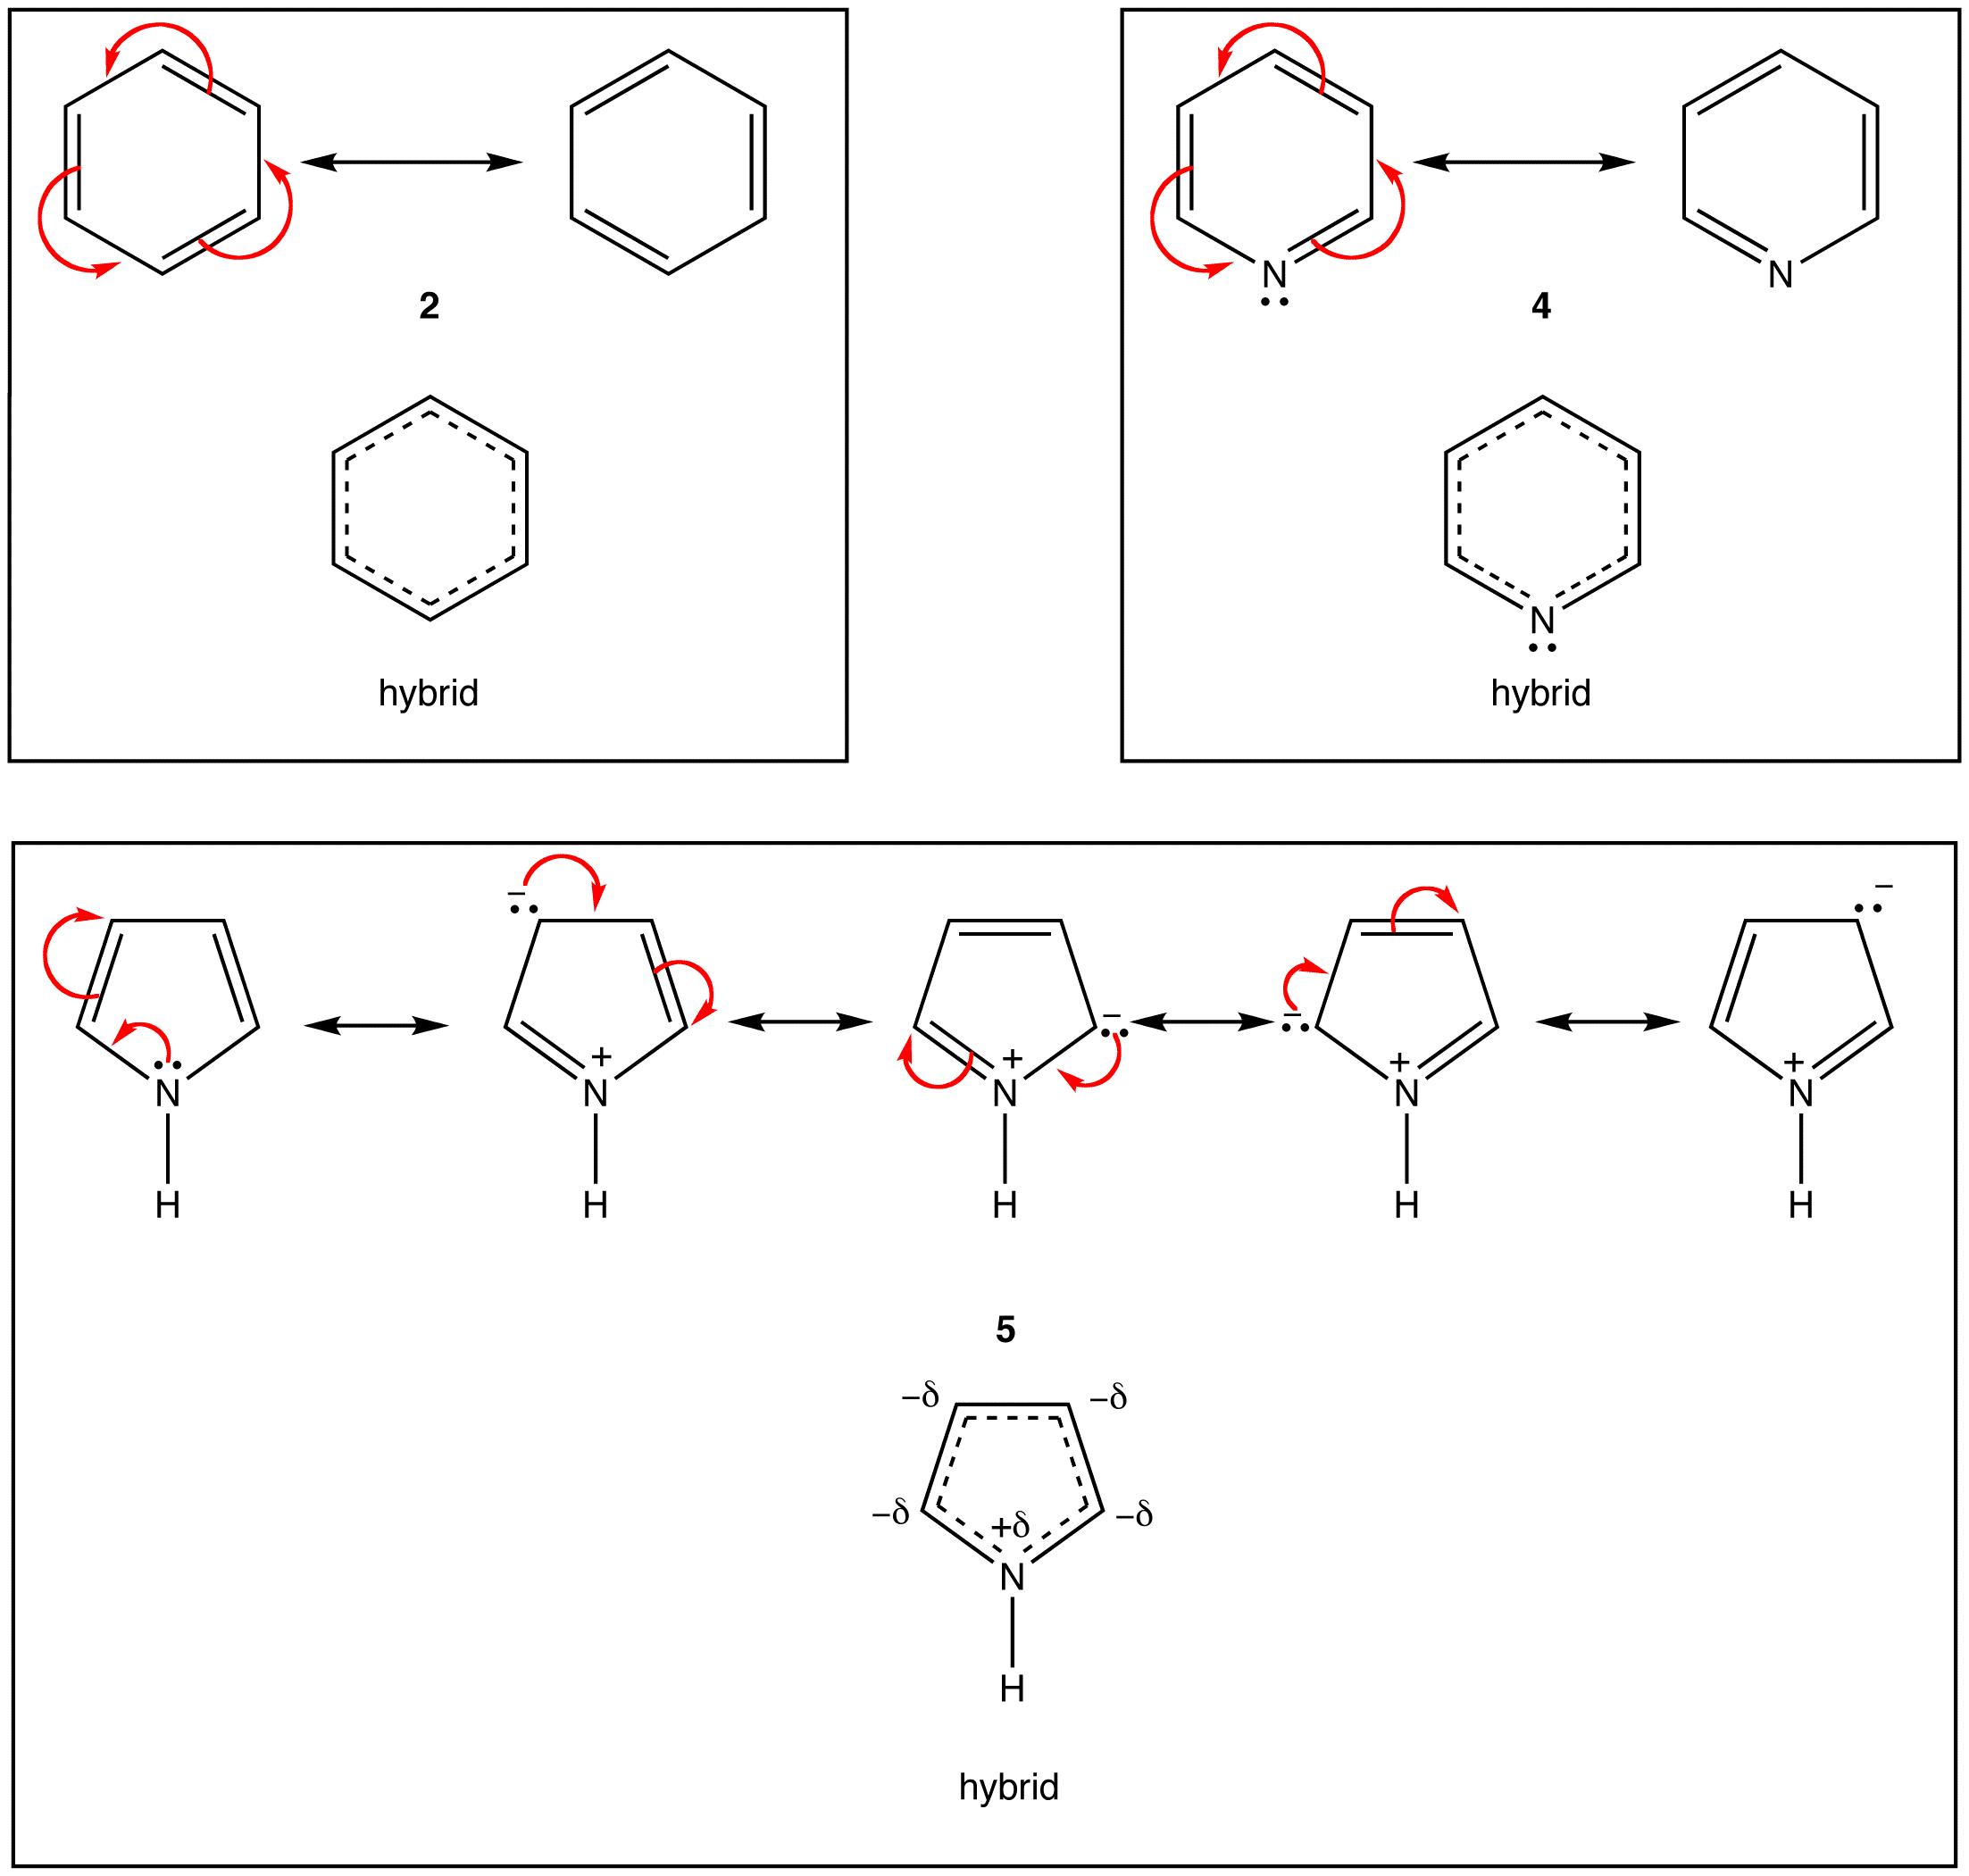 Aromatic | OChemPal